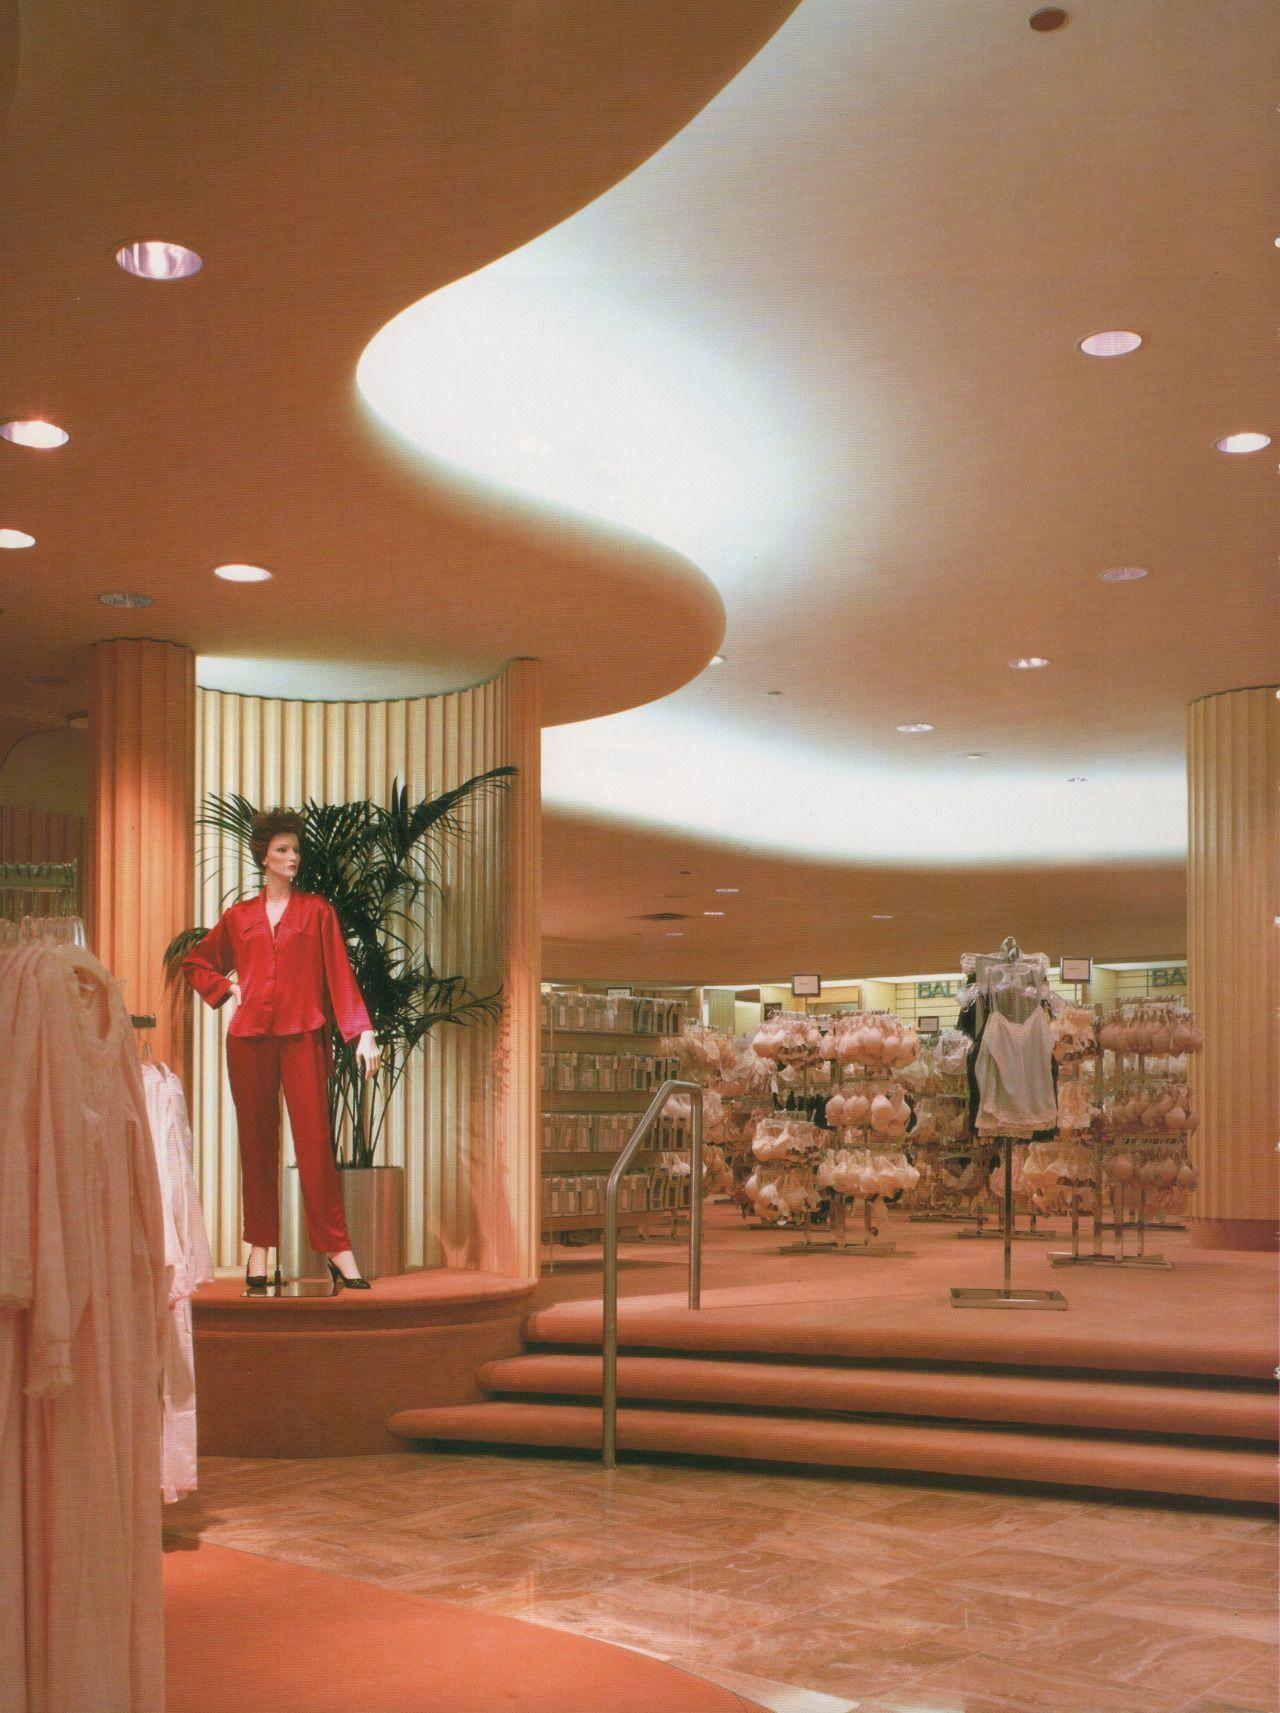 Palmandlaser macyss galleria dallas texas from the best of store designs bestinteriordesignschools also rh pinterest